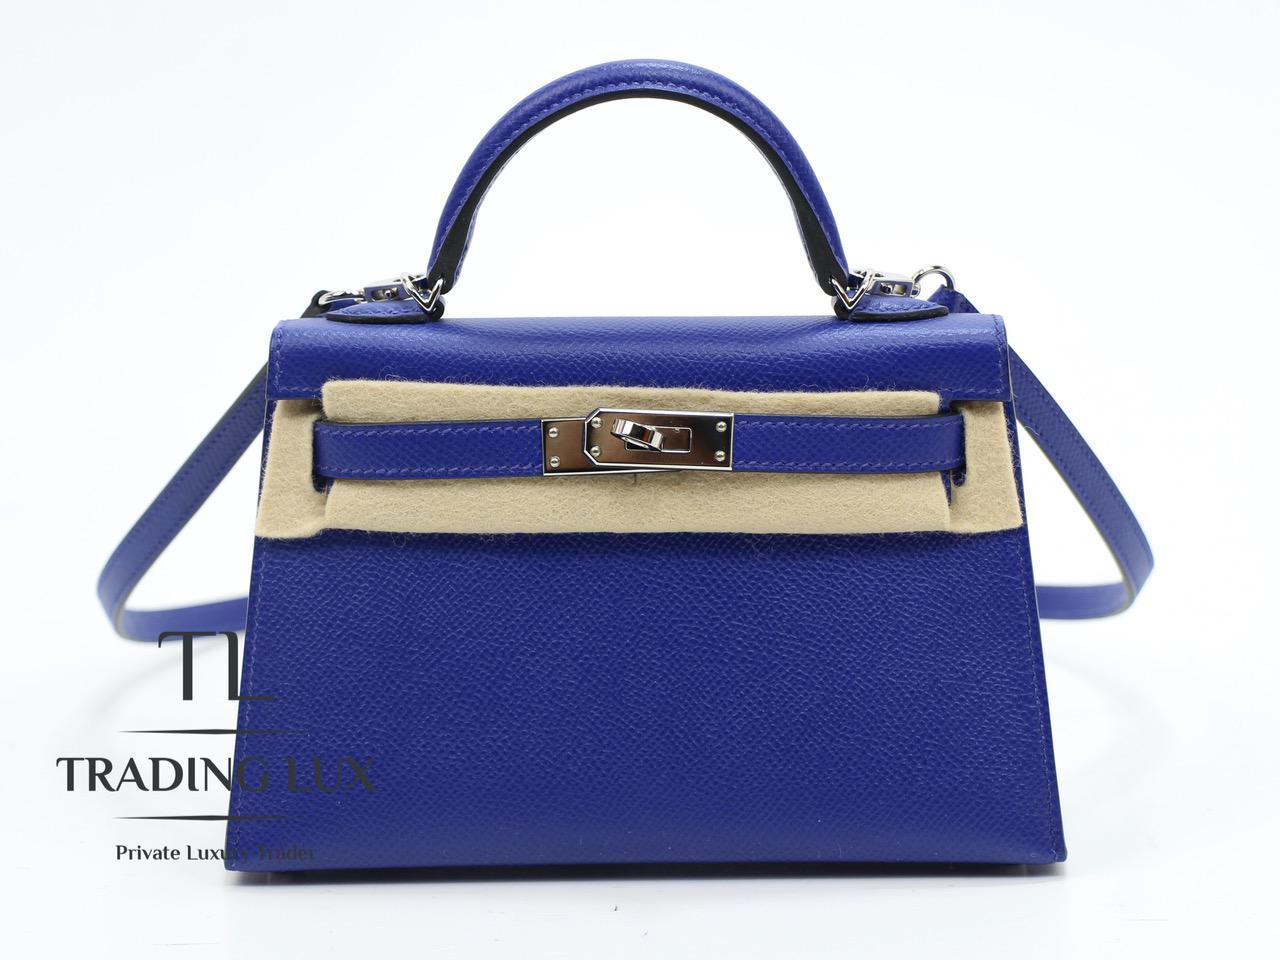 ermès-Mini-Kelly-20-Blue-Electric-6-1